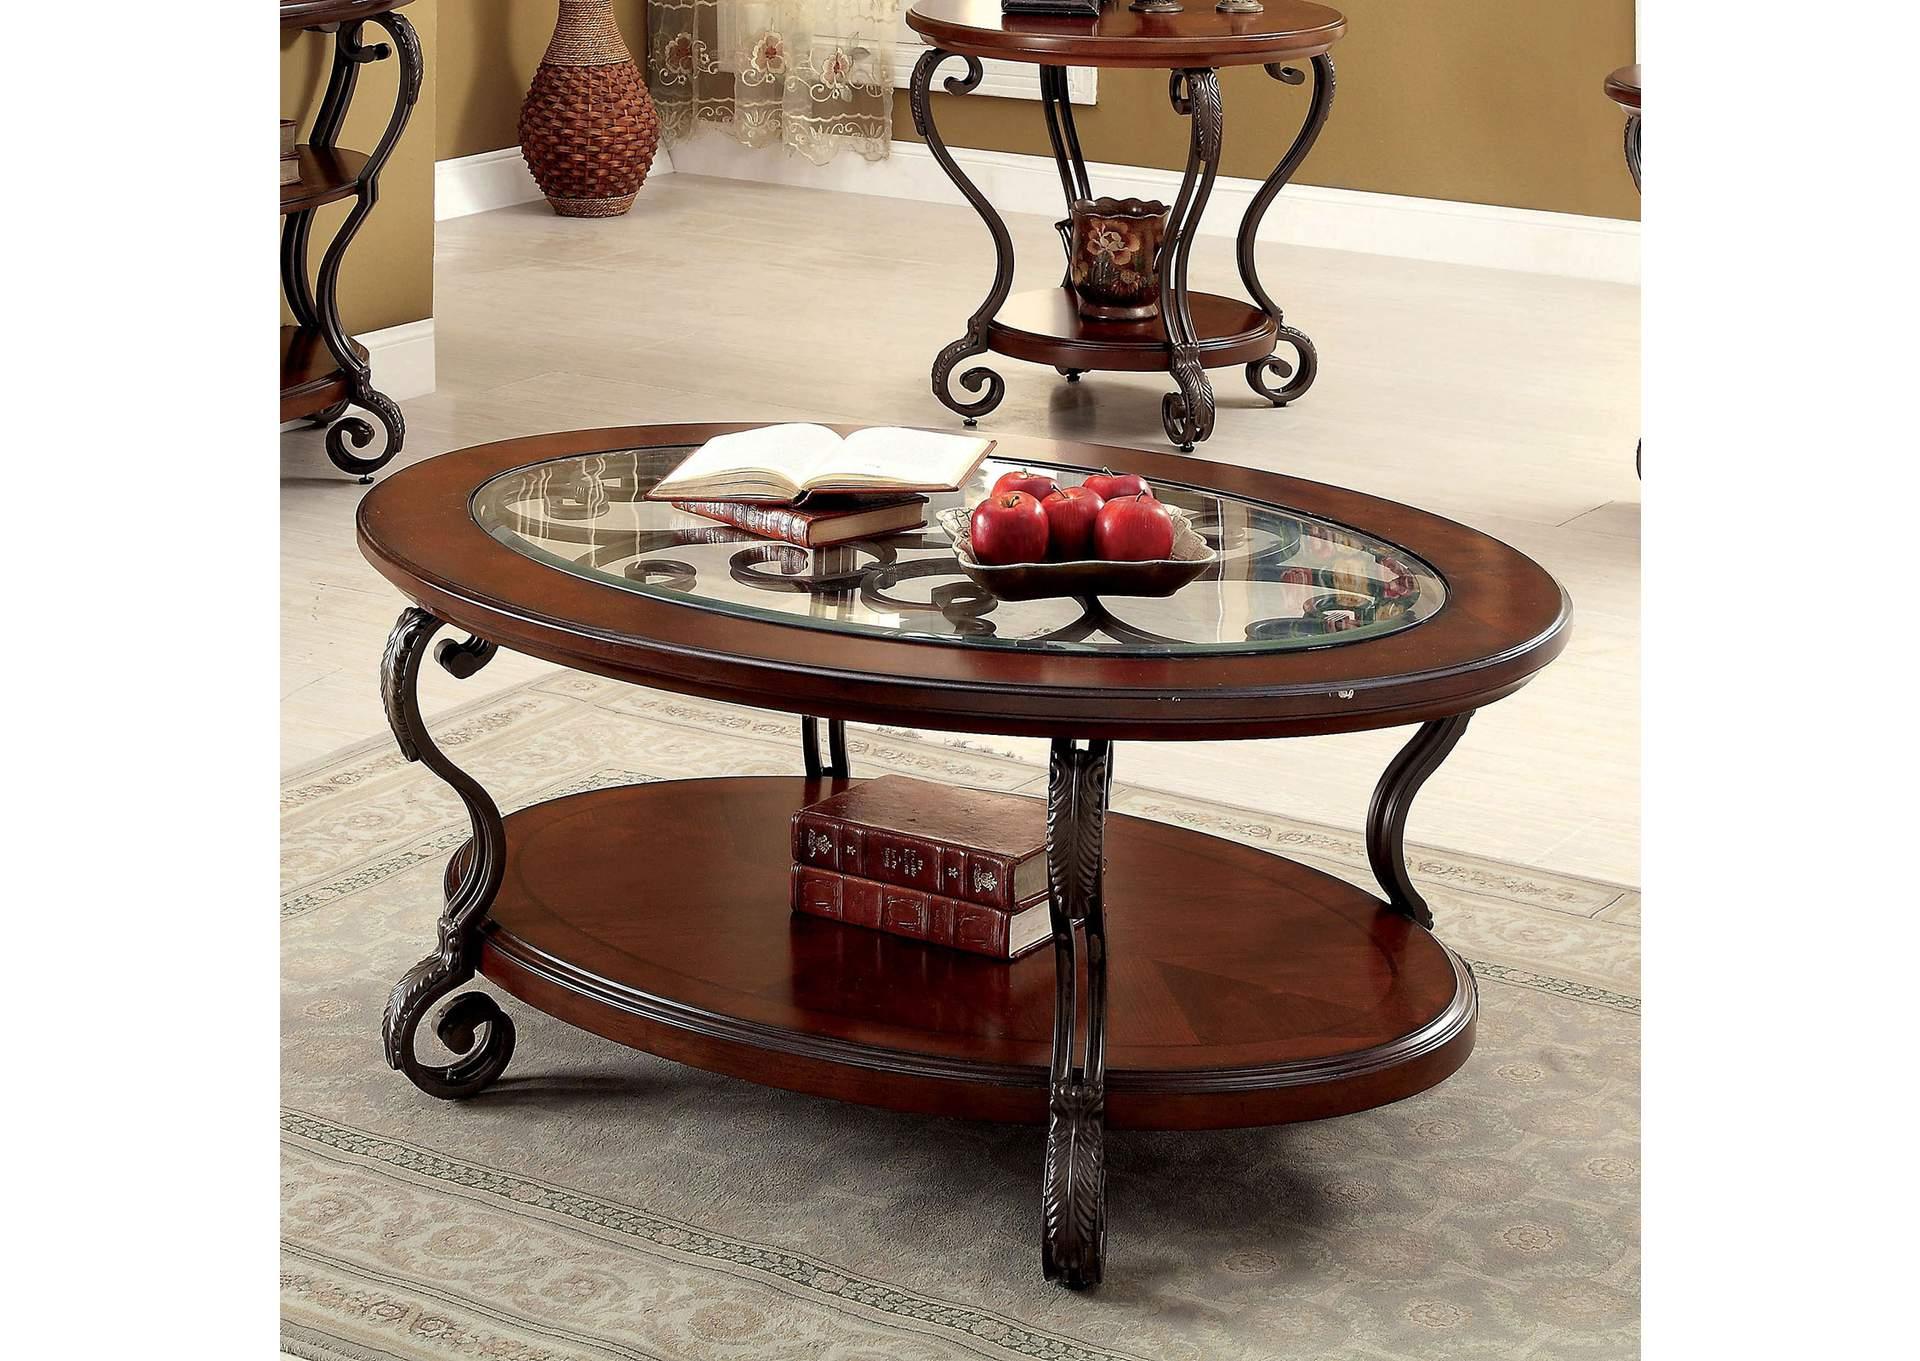 May Brown Cherry Ornate Coffee Table W/Glass Top U0026 Shelf,Furniture Of  America